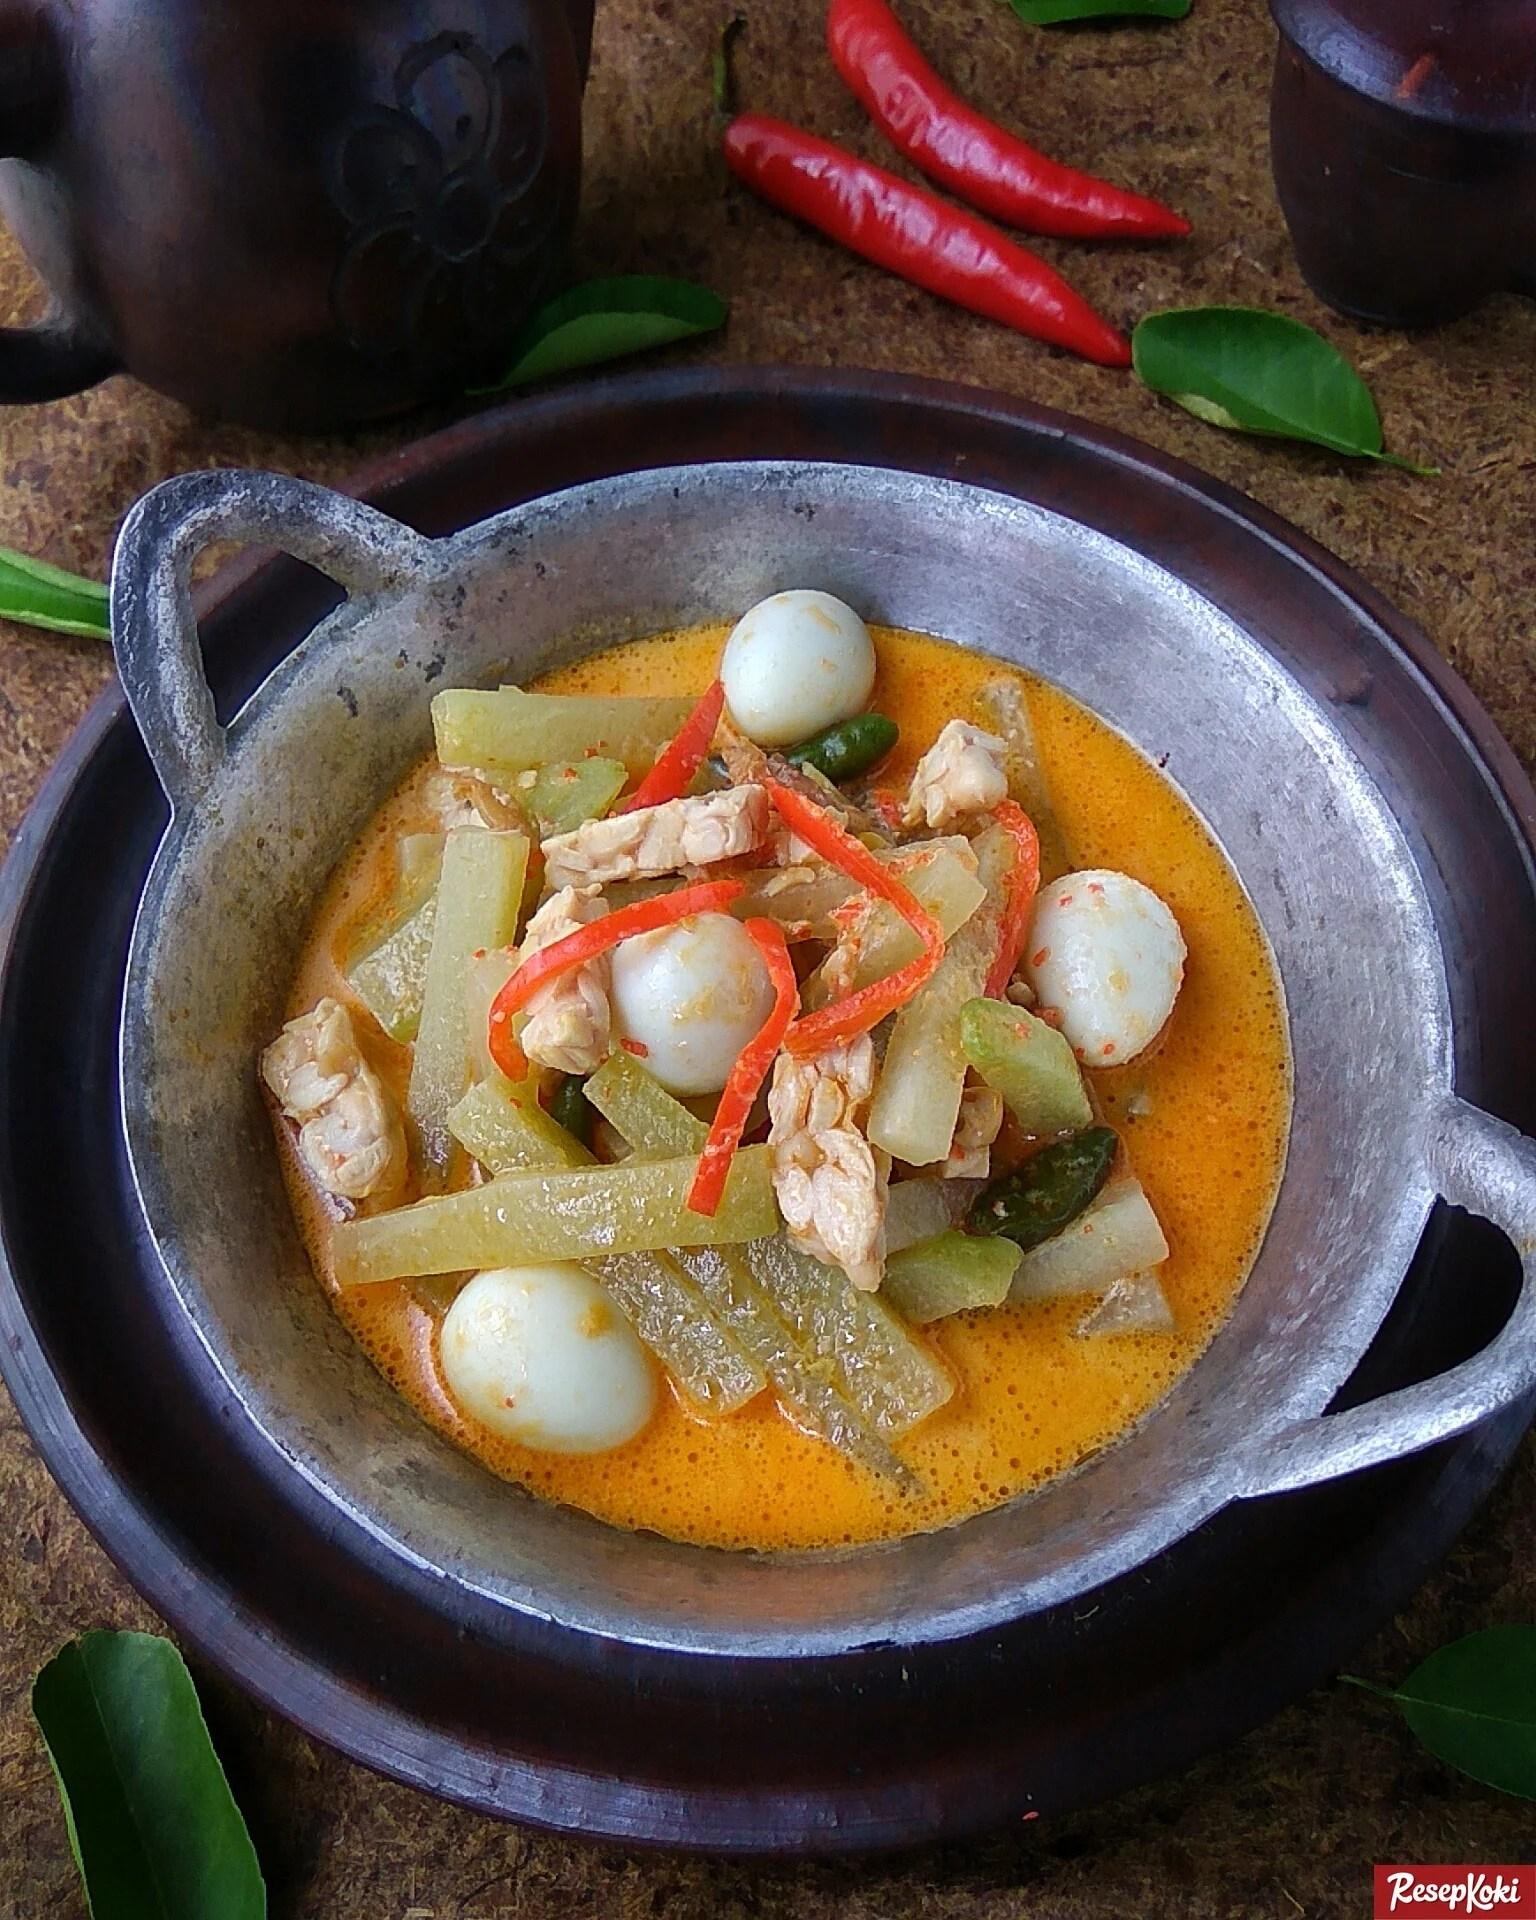 Resep Sayur Labu Siam Tanpa Santan : resep, sayur, tanpa, santan, Tumis, Telur, Puyuh, Istimewa, Praktis, Resep, ResepKoki